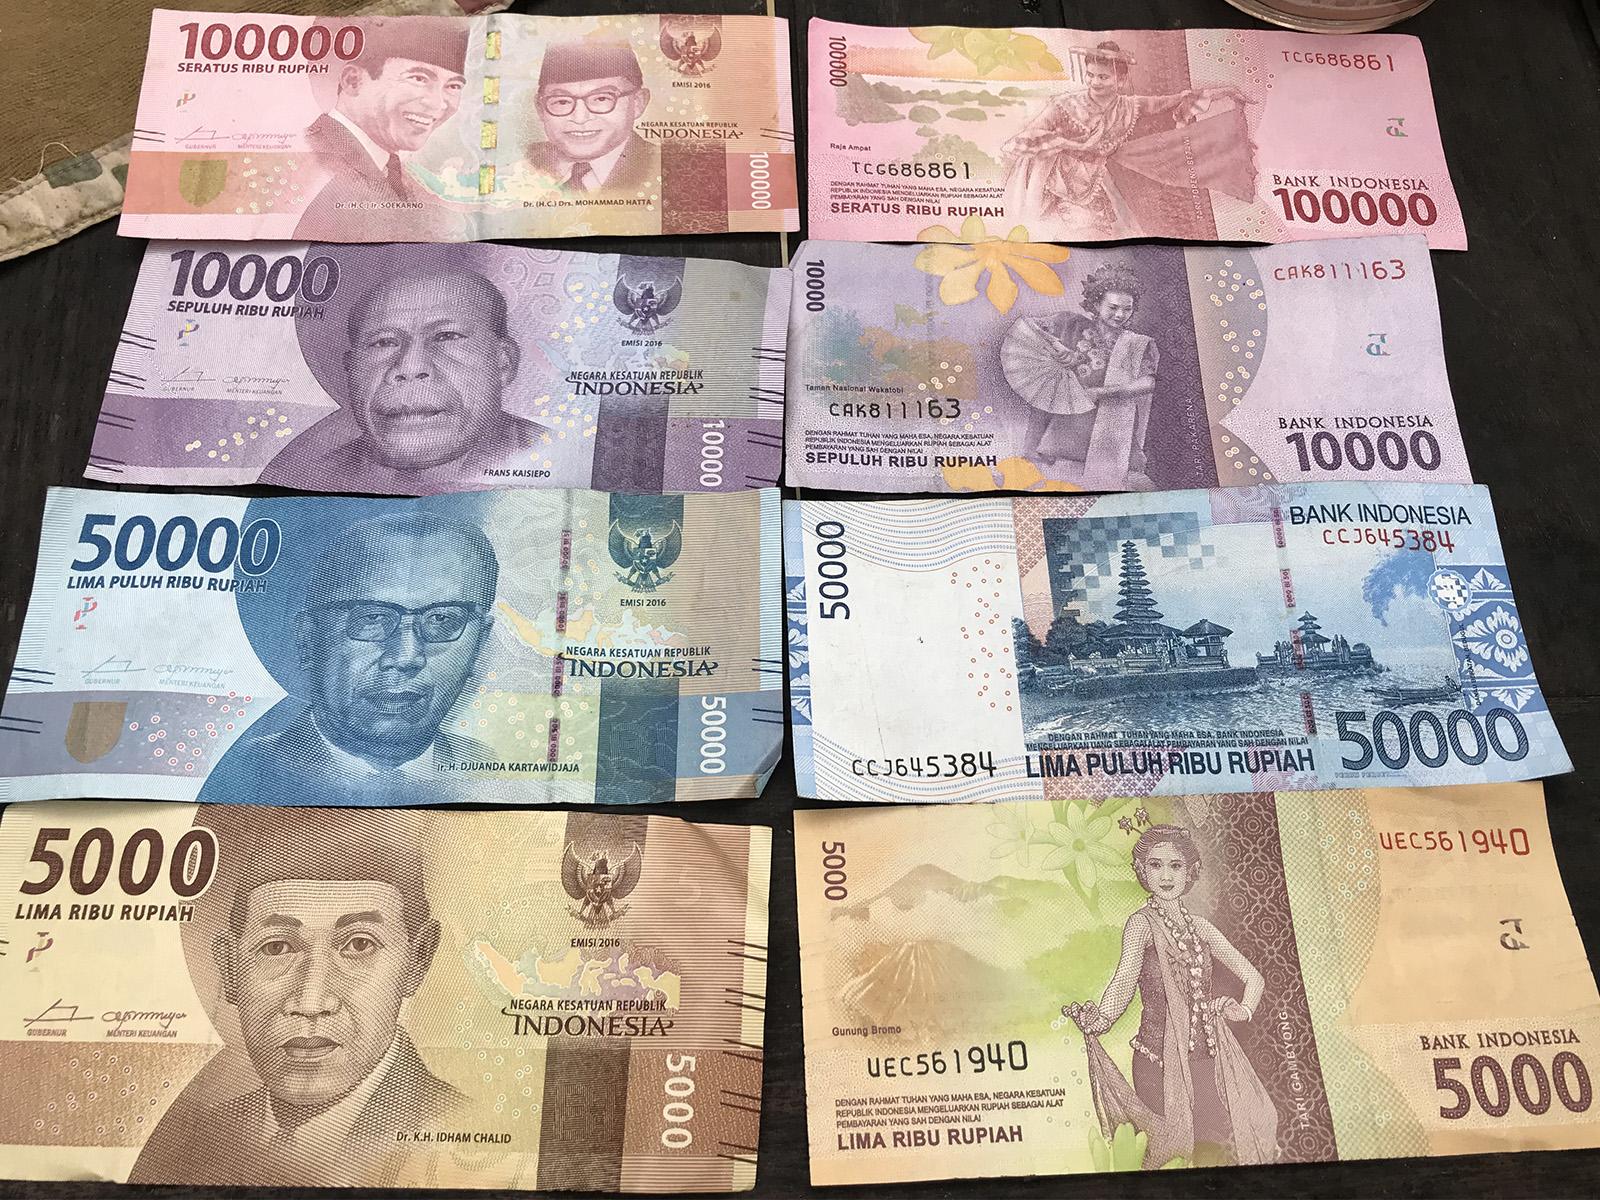 04 BALI FOTO03 - Indonezja- informacje ogólne